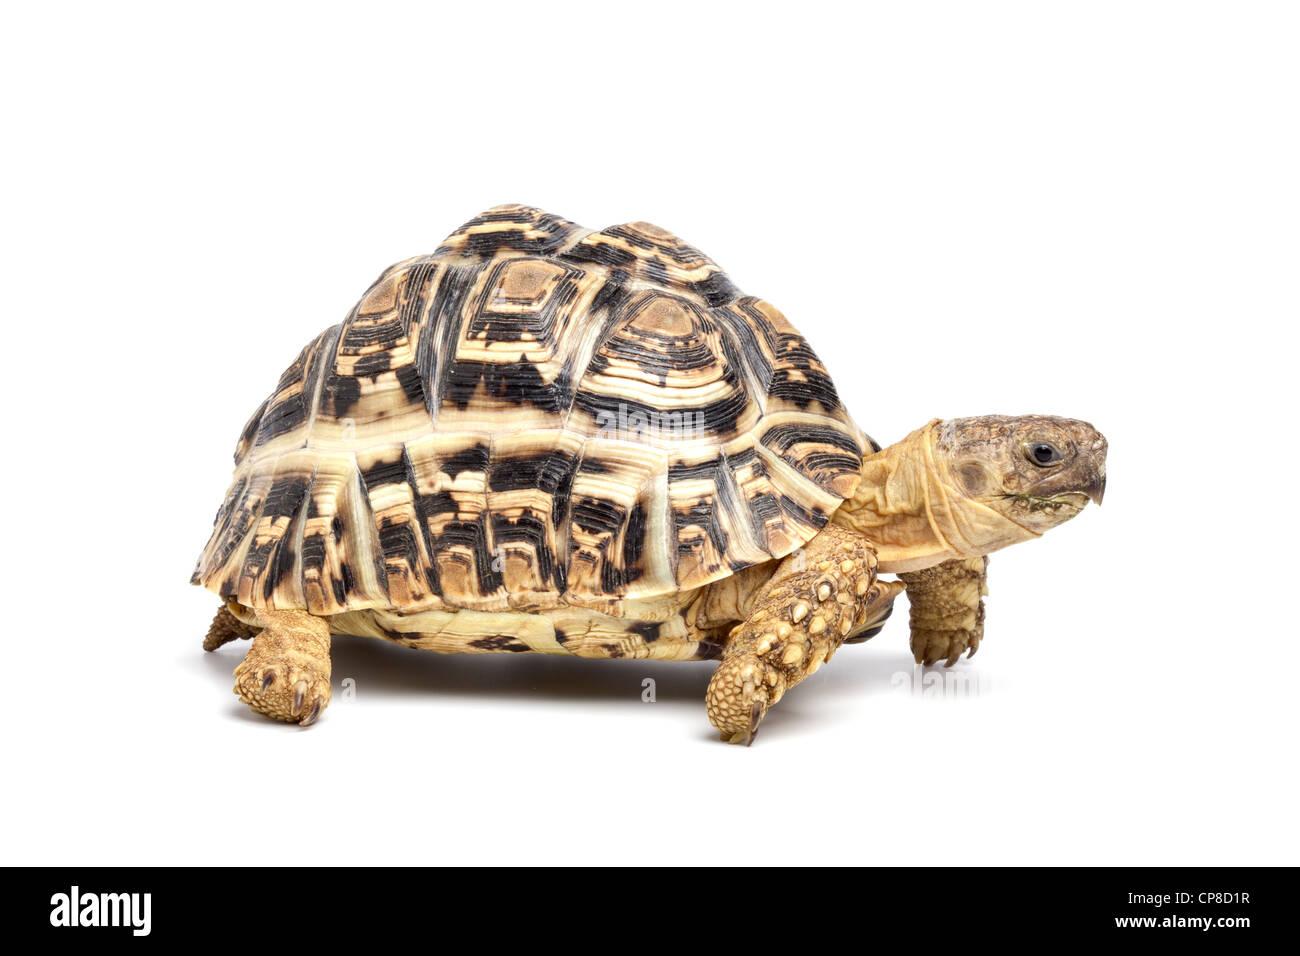 Leopard tortoise, Stigmochelys pardalis - Stock Image